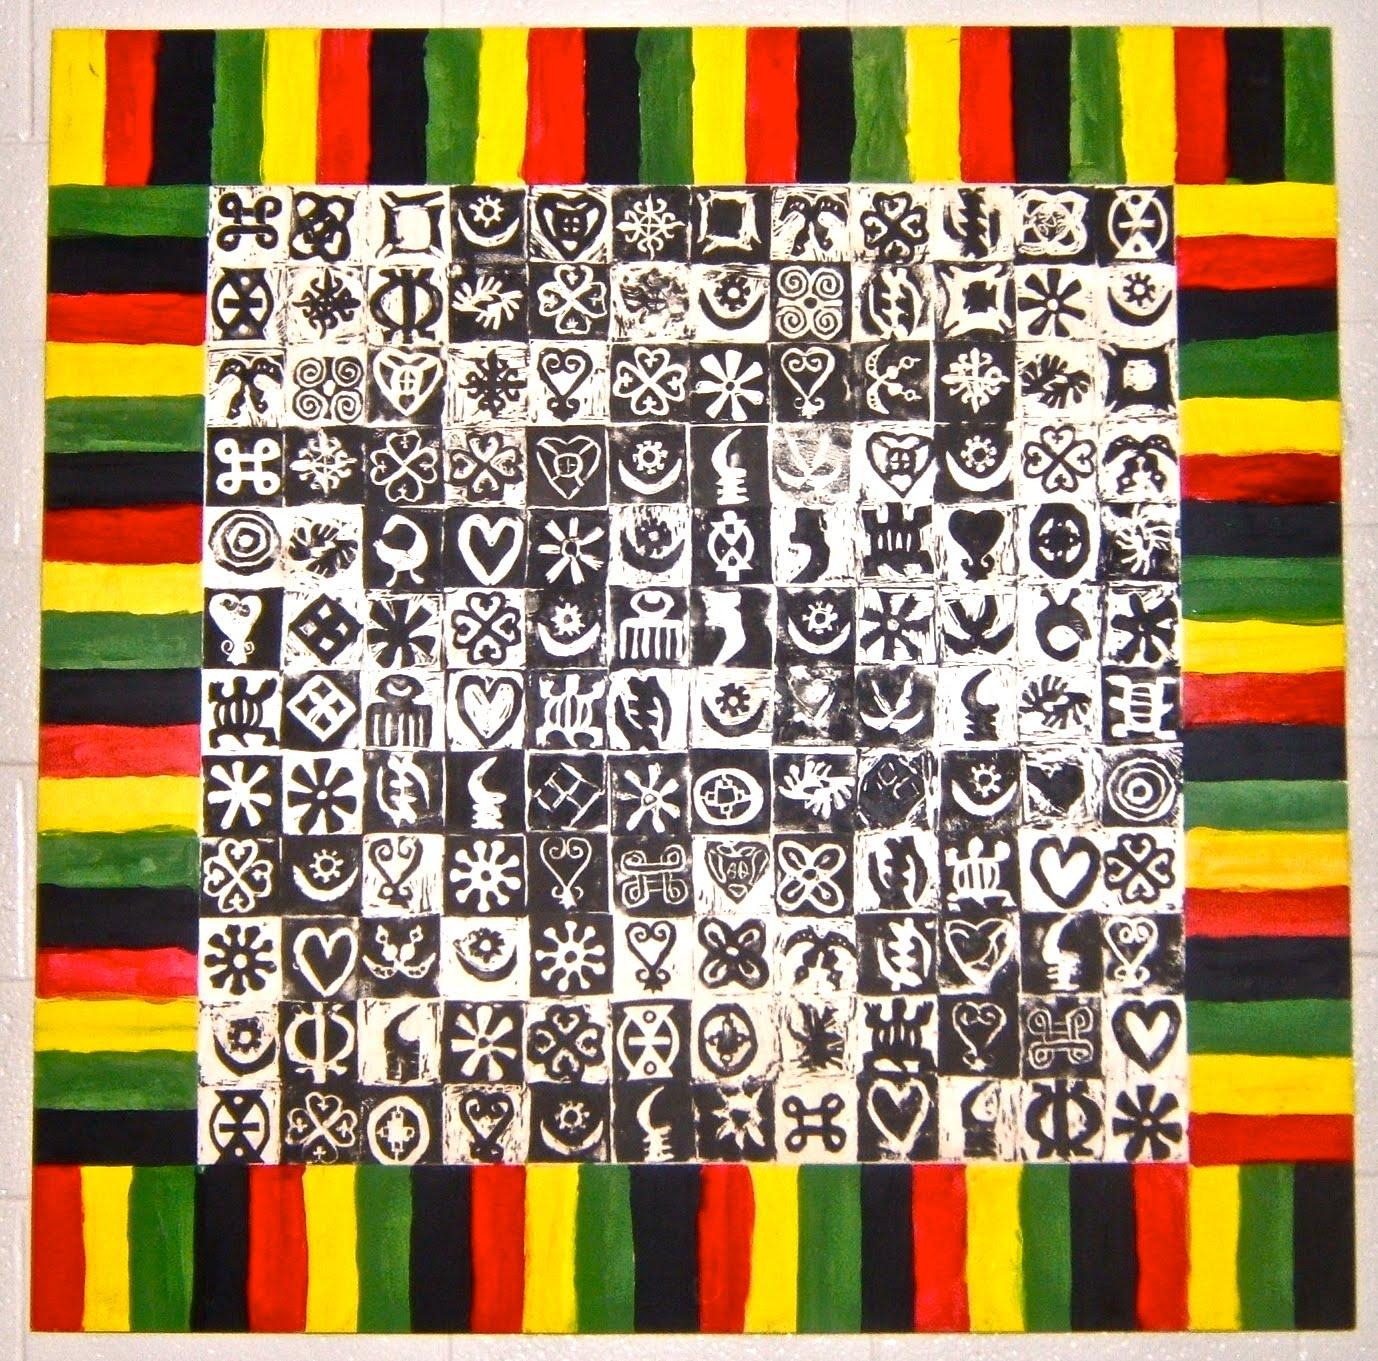 The Adinkra Symbols Queen Nzinga Maxwell